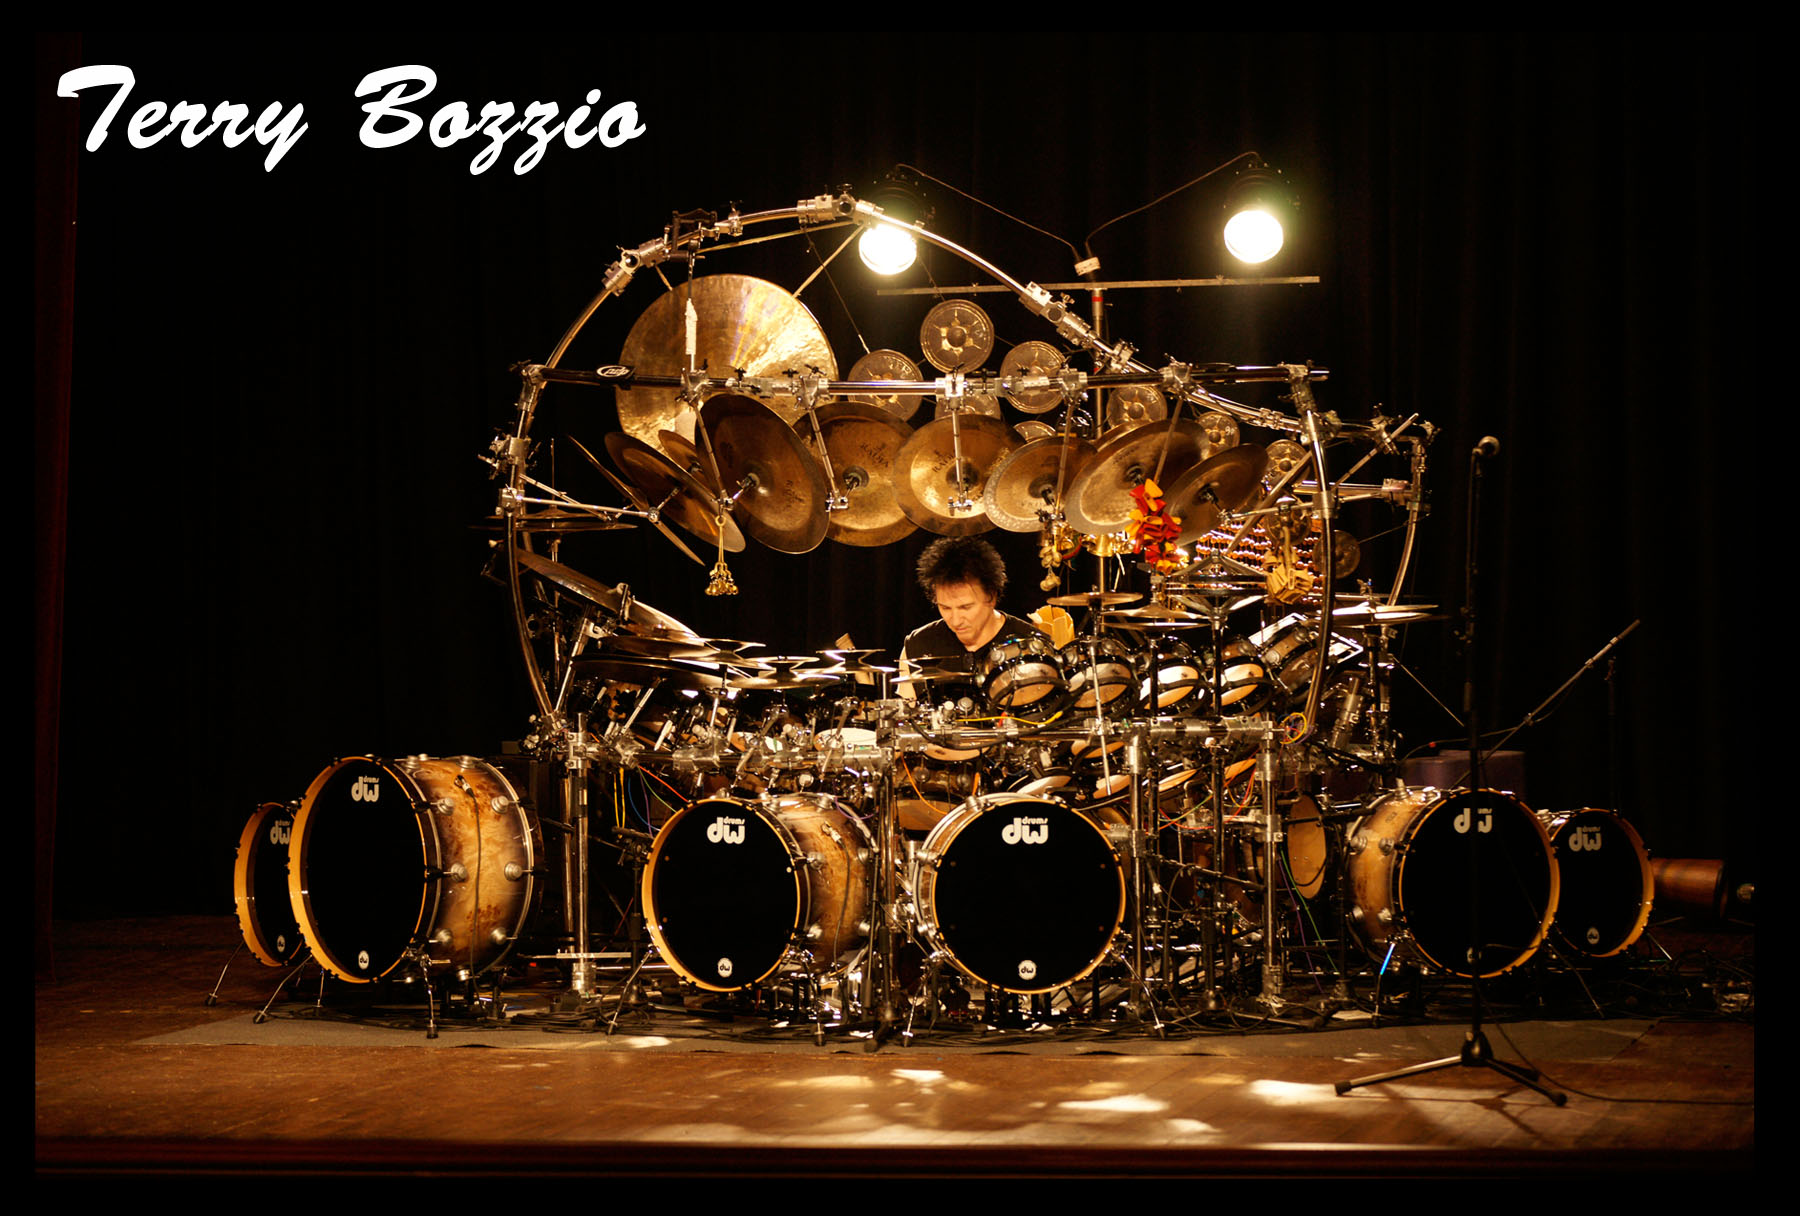 Terry-Bozzio-2.jpg